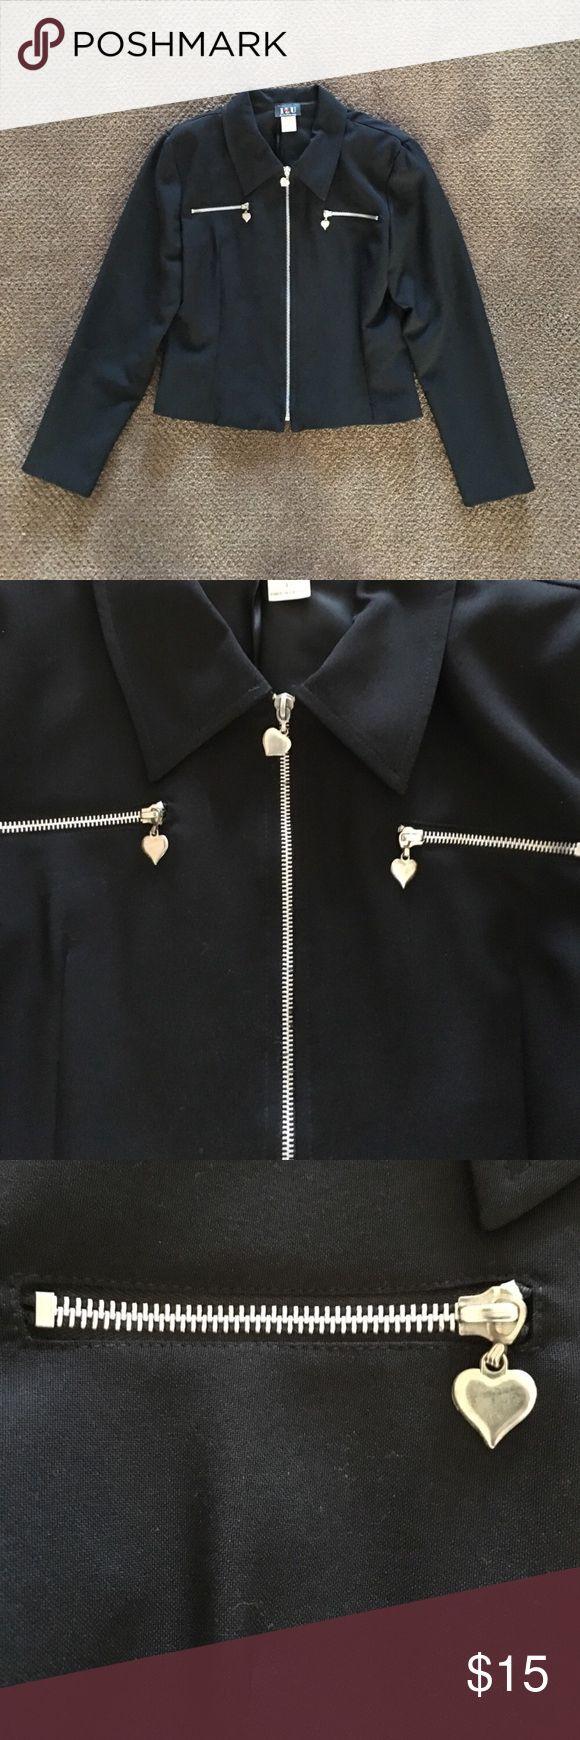 "I L U Black Zip Up Blazer 100% polyester jacket w silver zippers & heart zipper pulls. Arm length approx 23"". Great condition. Runs big so fits junior large or woman small. Smoke & pet free home. i l u Jackets & Coats Blazers"